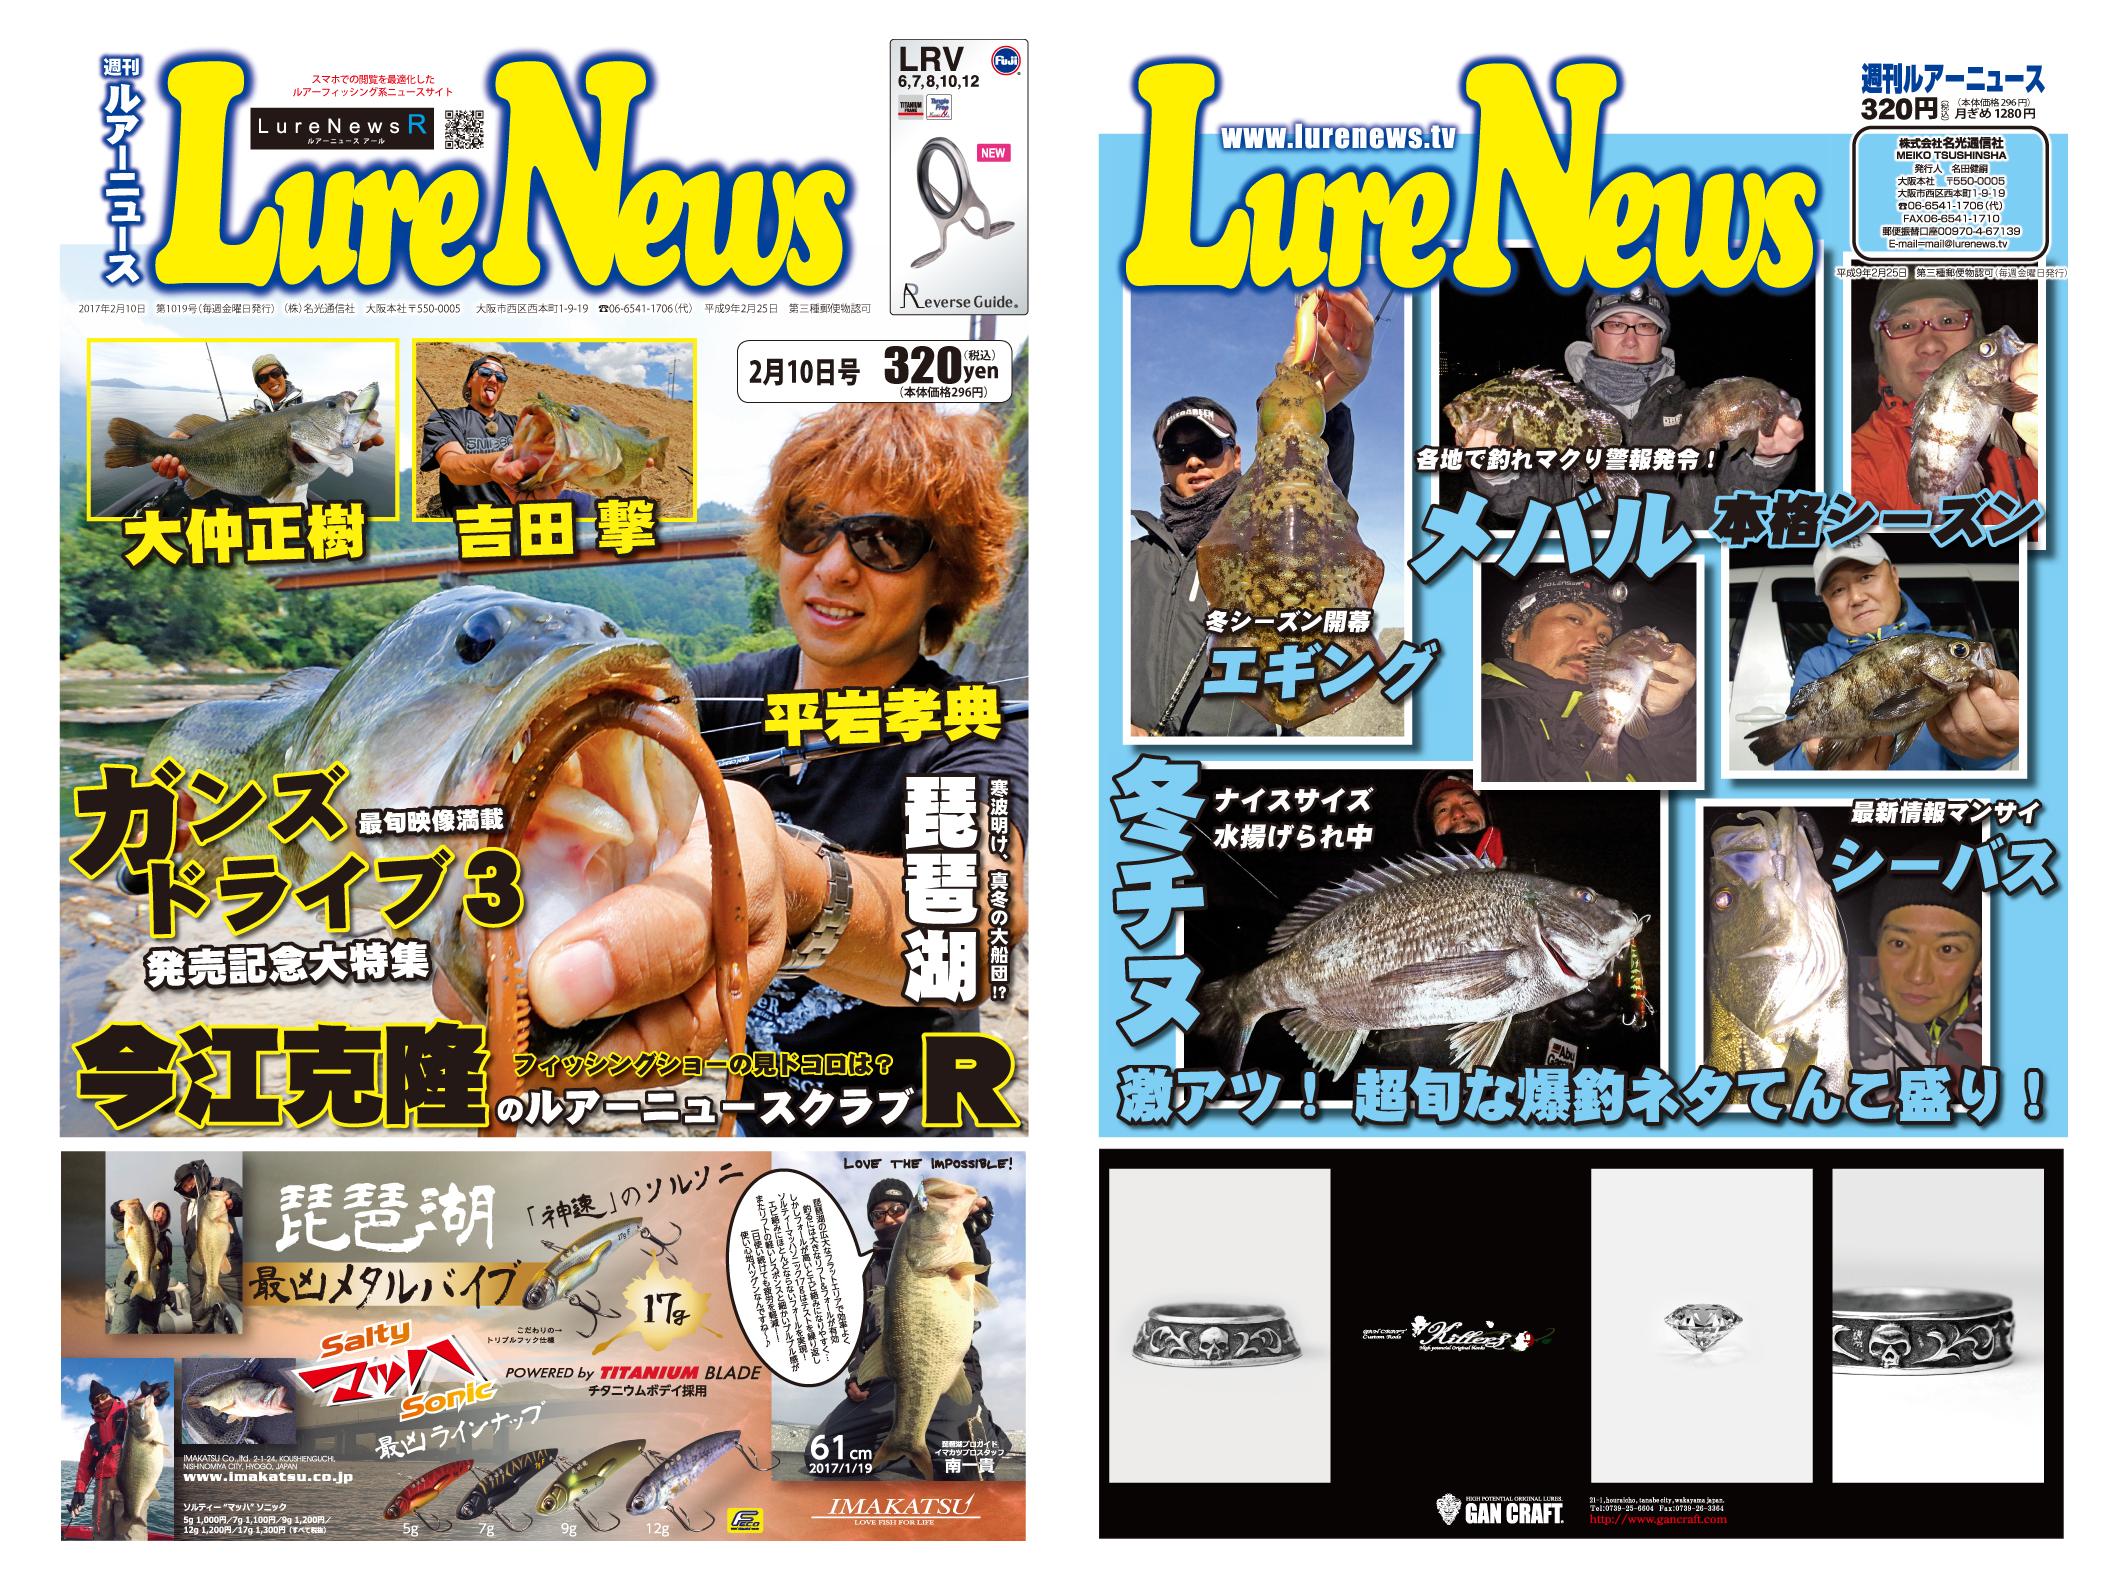 http://lurenews.tv/LureNews1019%E5%8F%B7-1.jpg